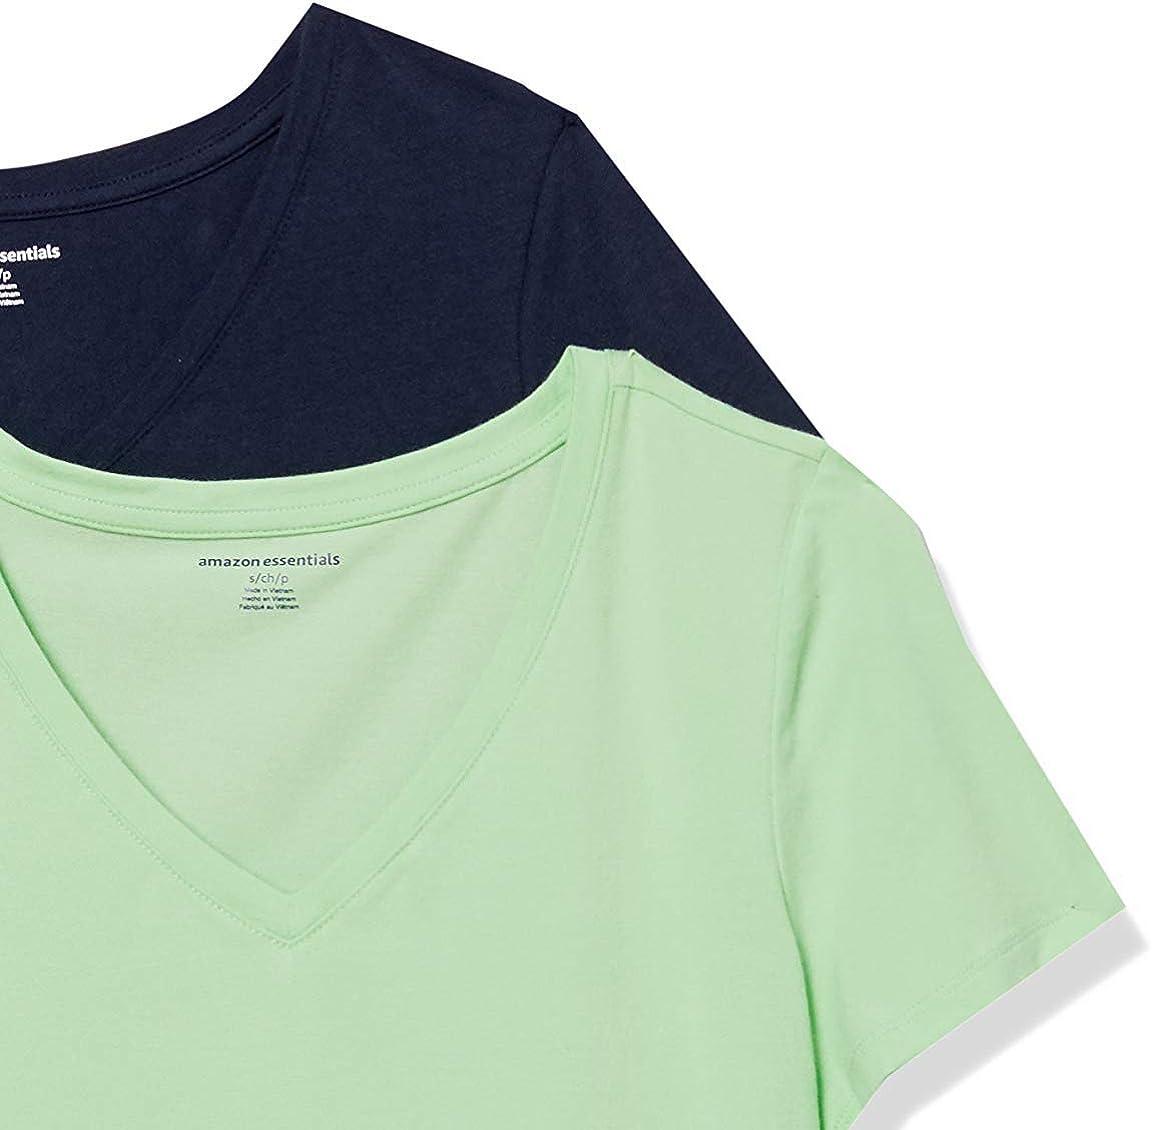 Amazon Essentials Women's 2-Pack Classic-Fit Short-Sleeve V-Neck T-Shirt